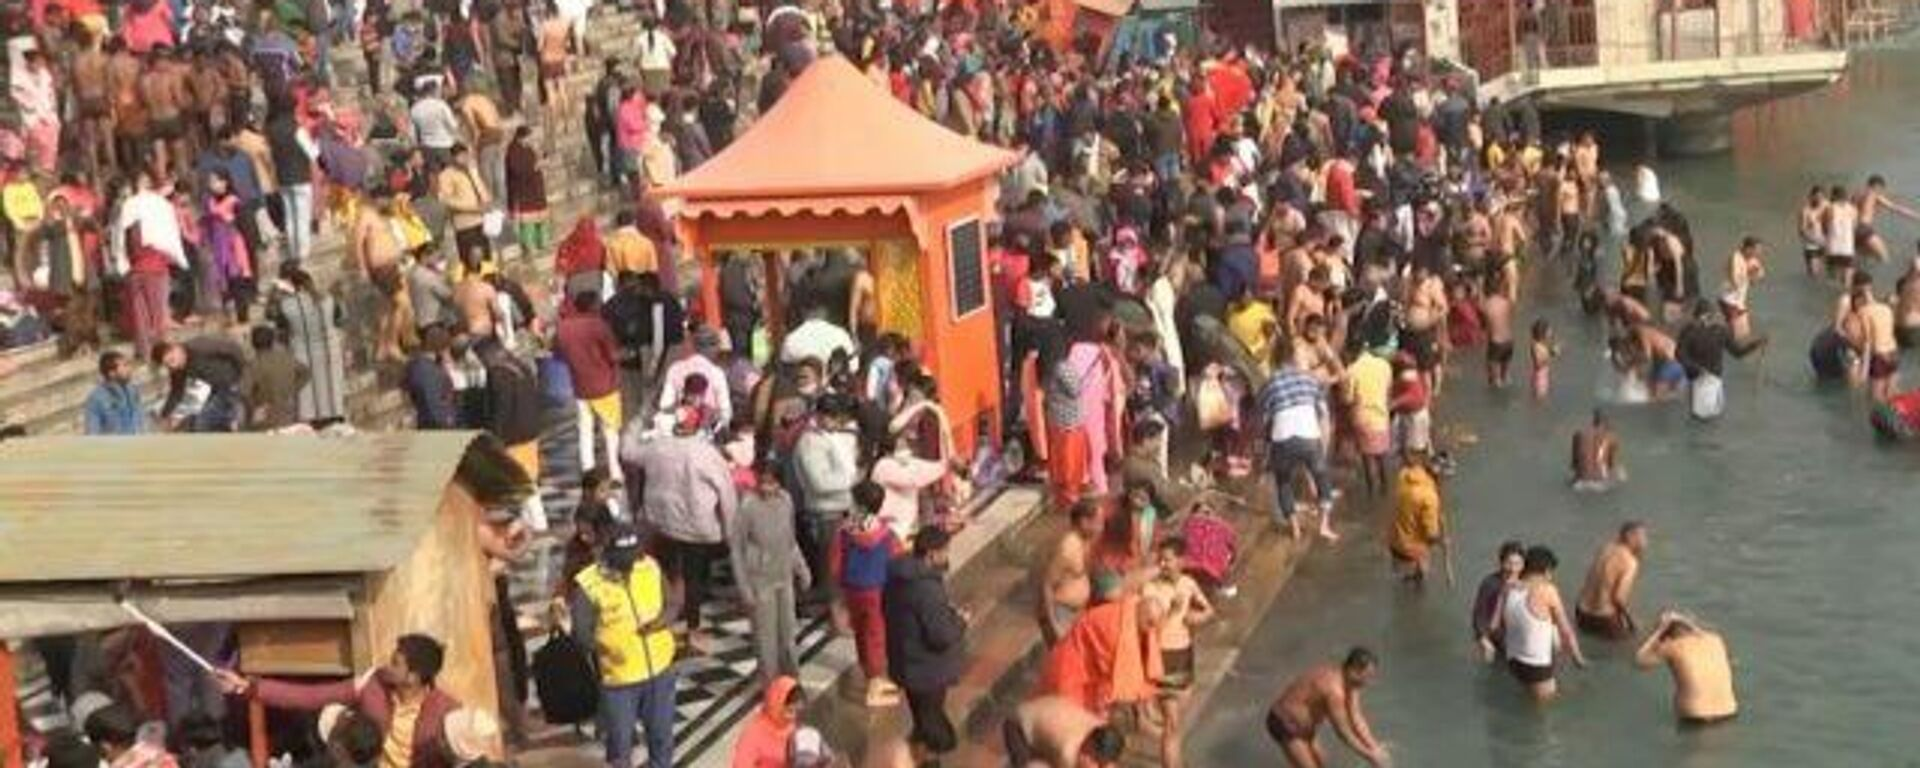 Millones de indios inundan el río Ganges a pesar de la pandemia - Sputnik Mundo, 1920, 14.04.2021